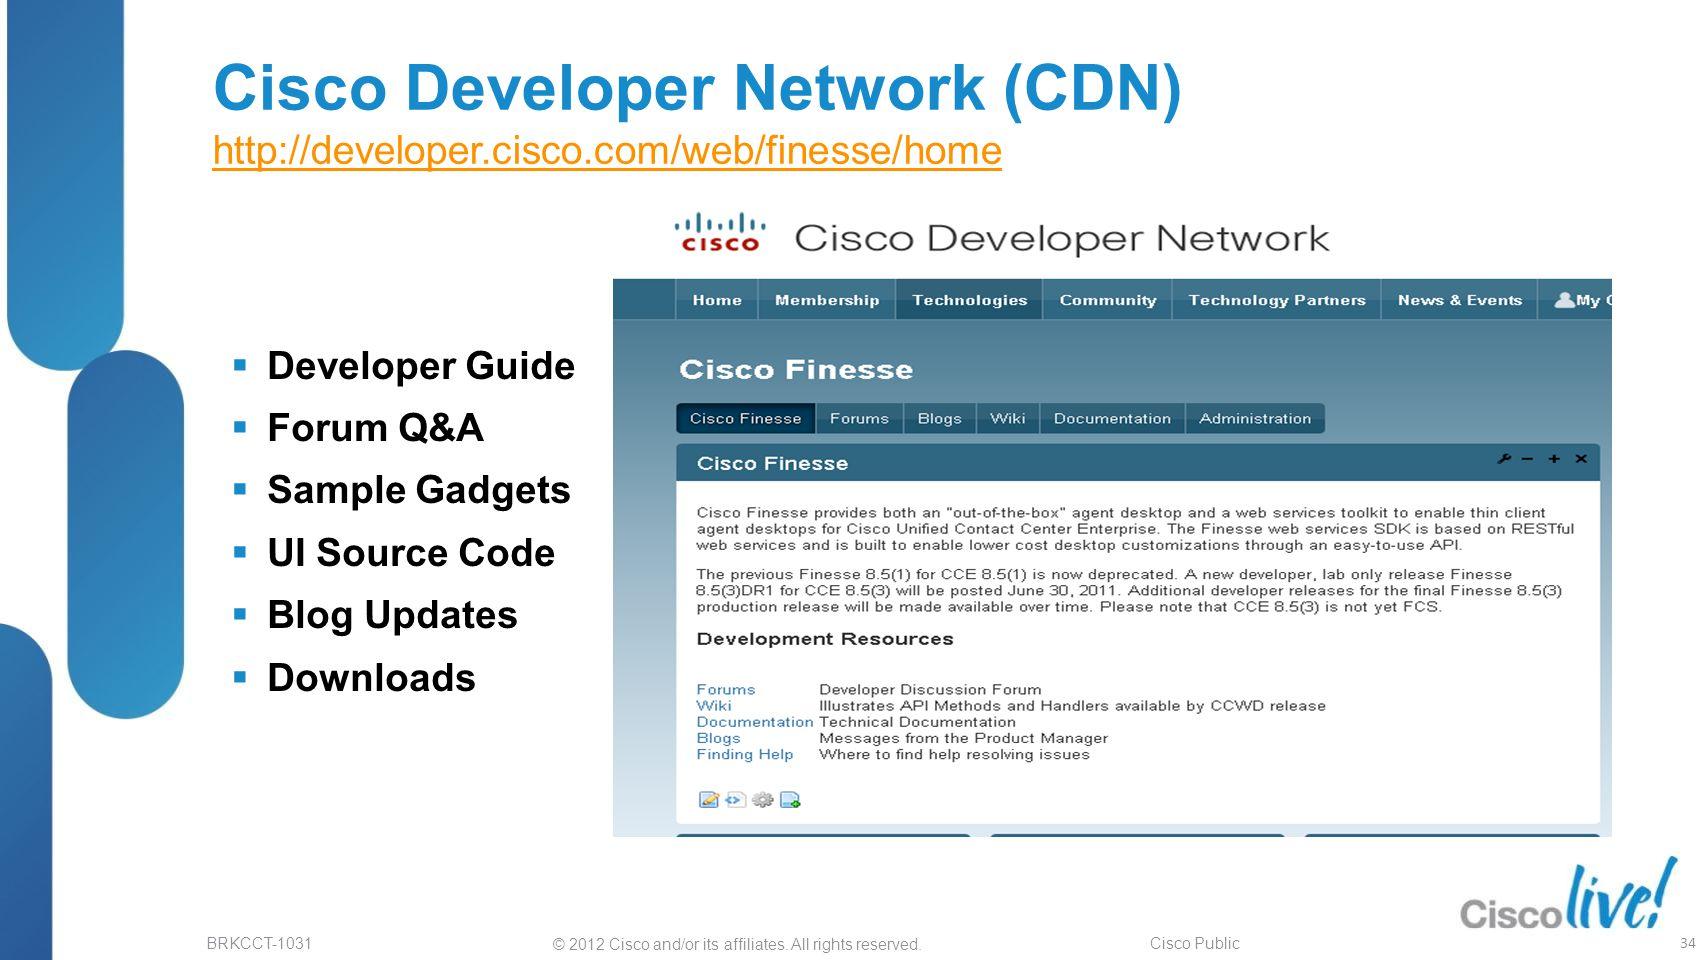 © 2012 Cisco and/or its affiliates. All rights reserved. BRKCCT-1031 Cisco Public Cisco Developer Network (CDN) http://developer.cisco.com/web/finesse